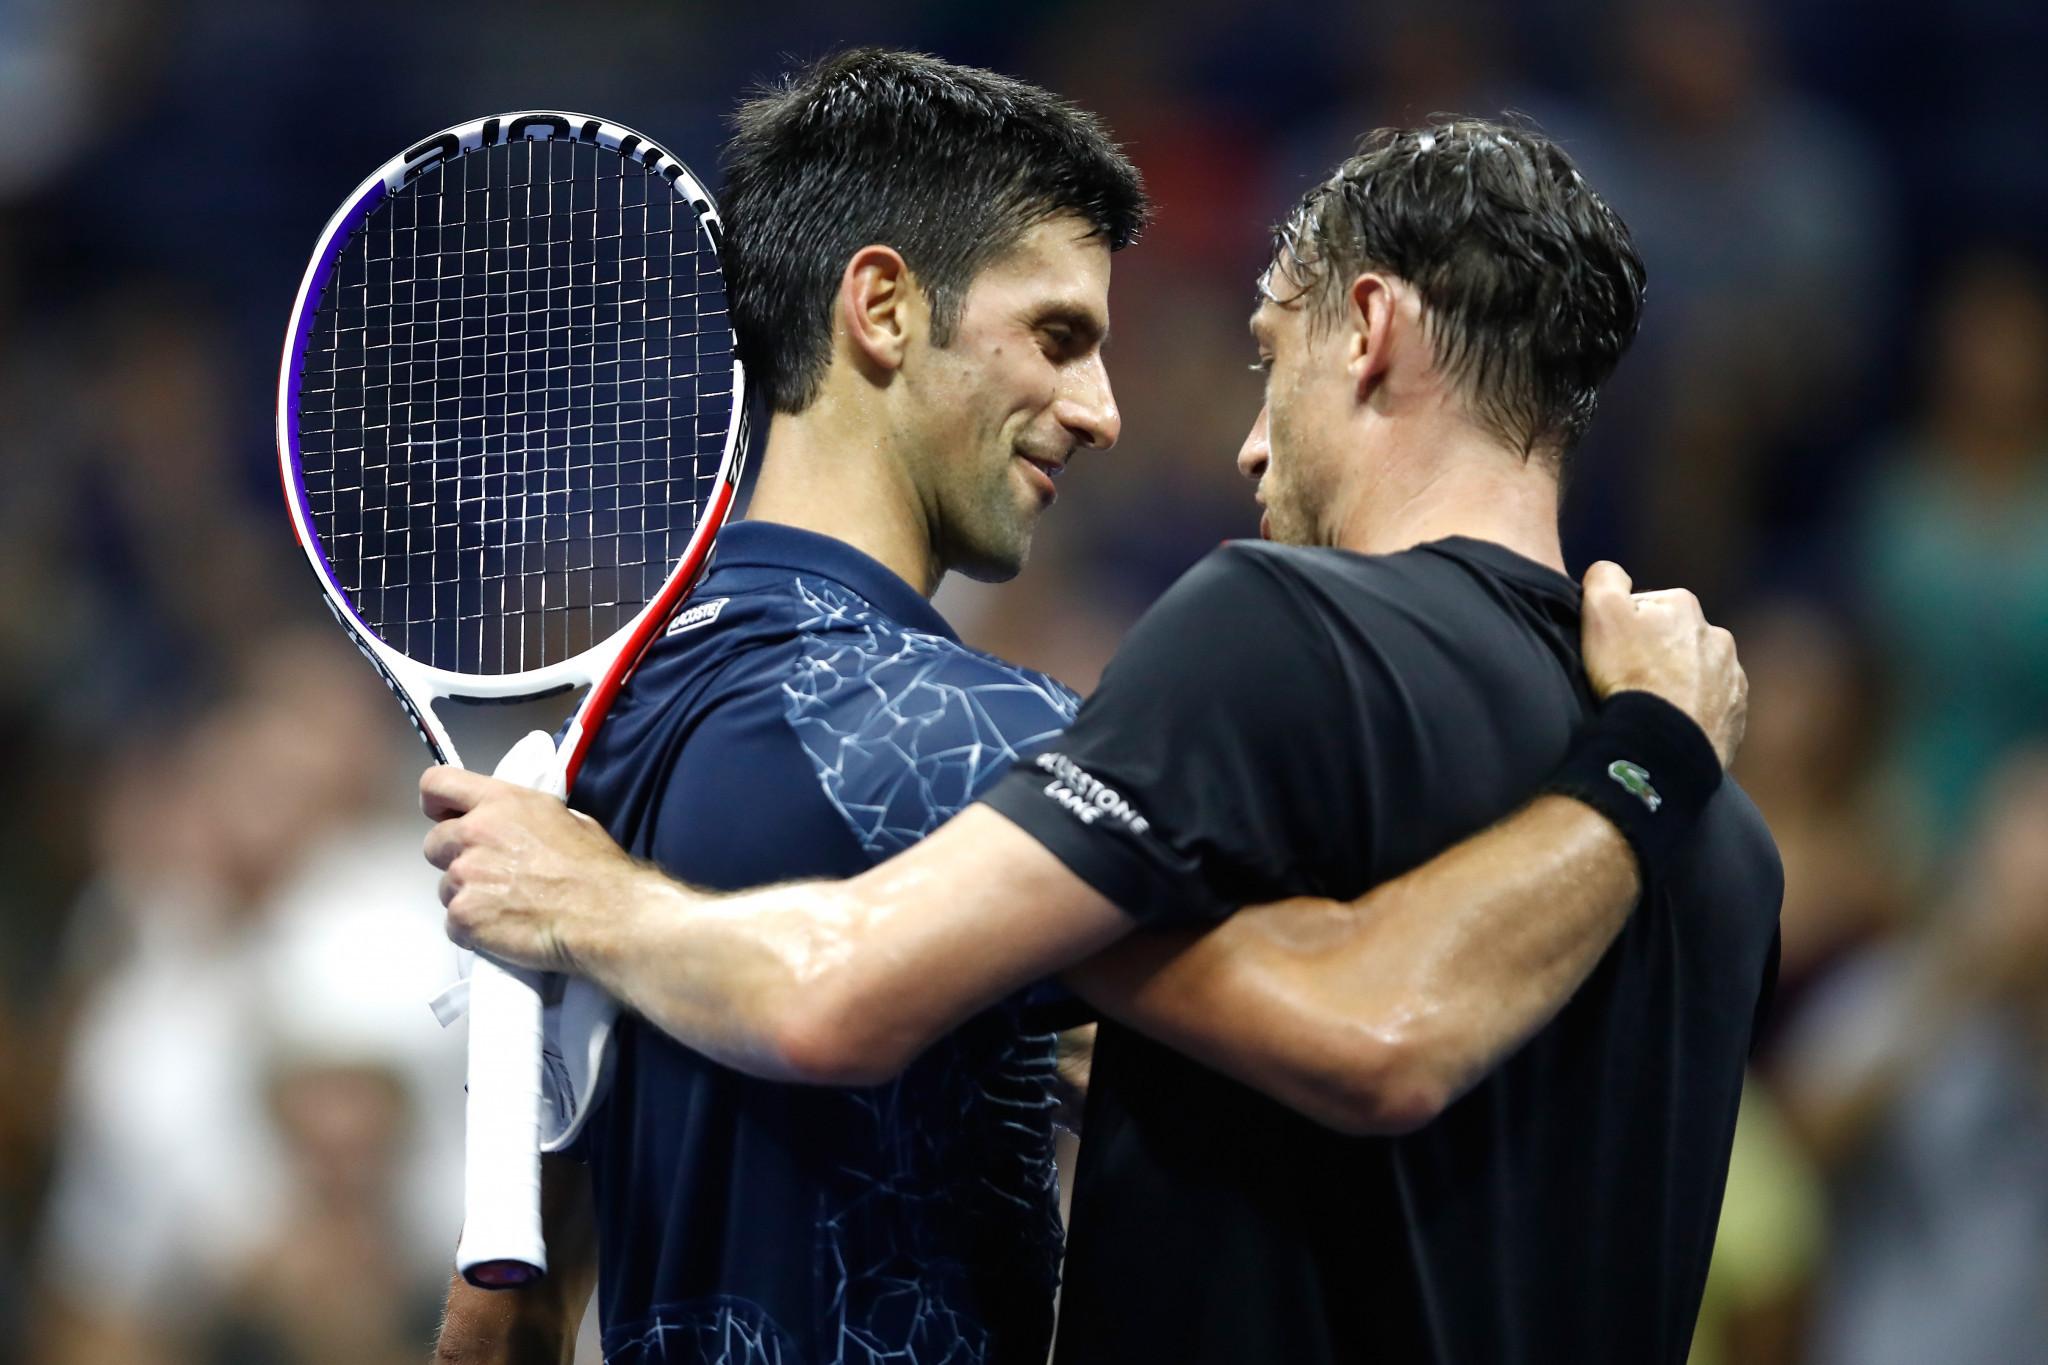 Djokovic and Nishikori set up US Open semi-final